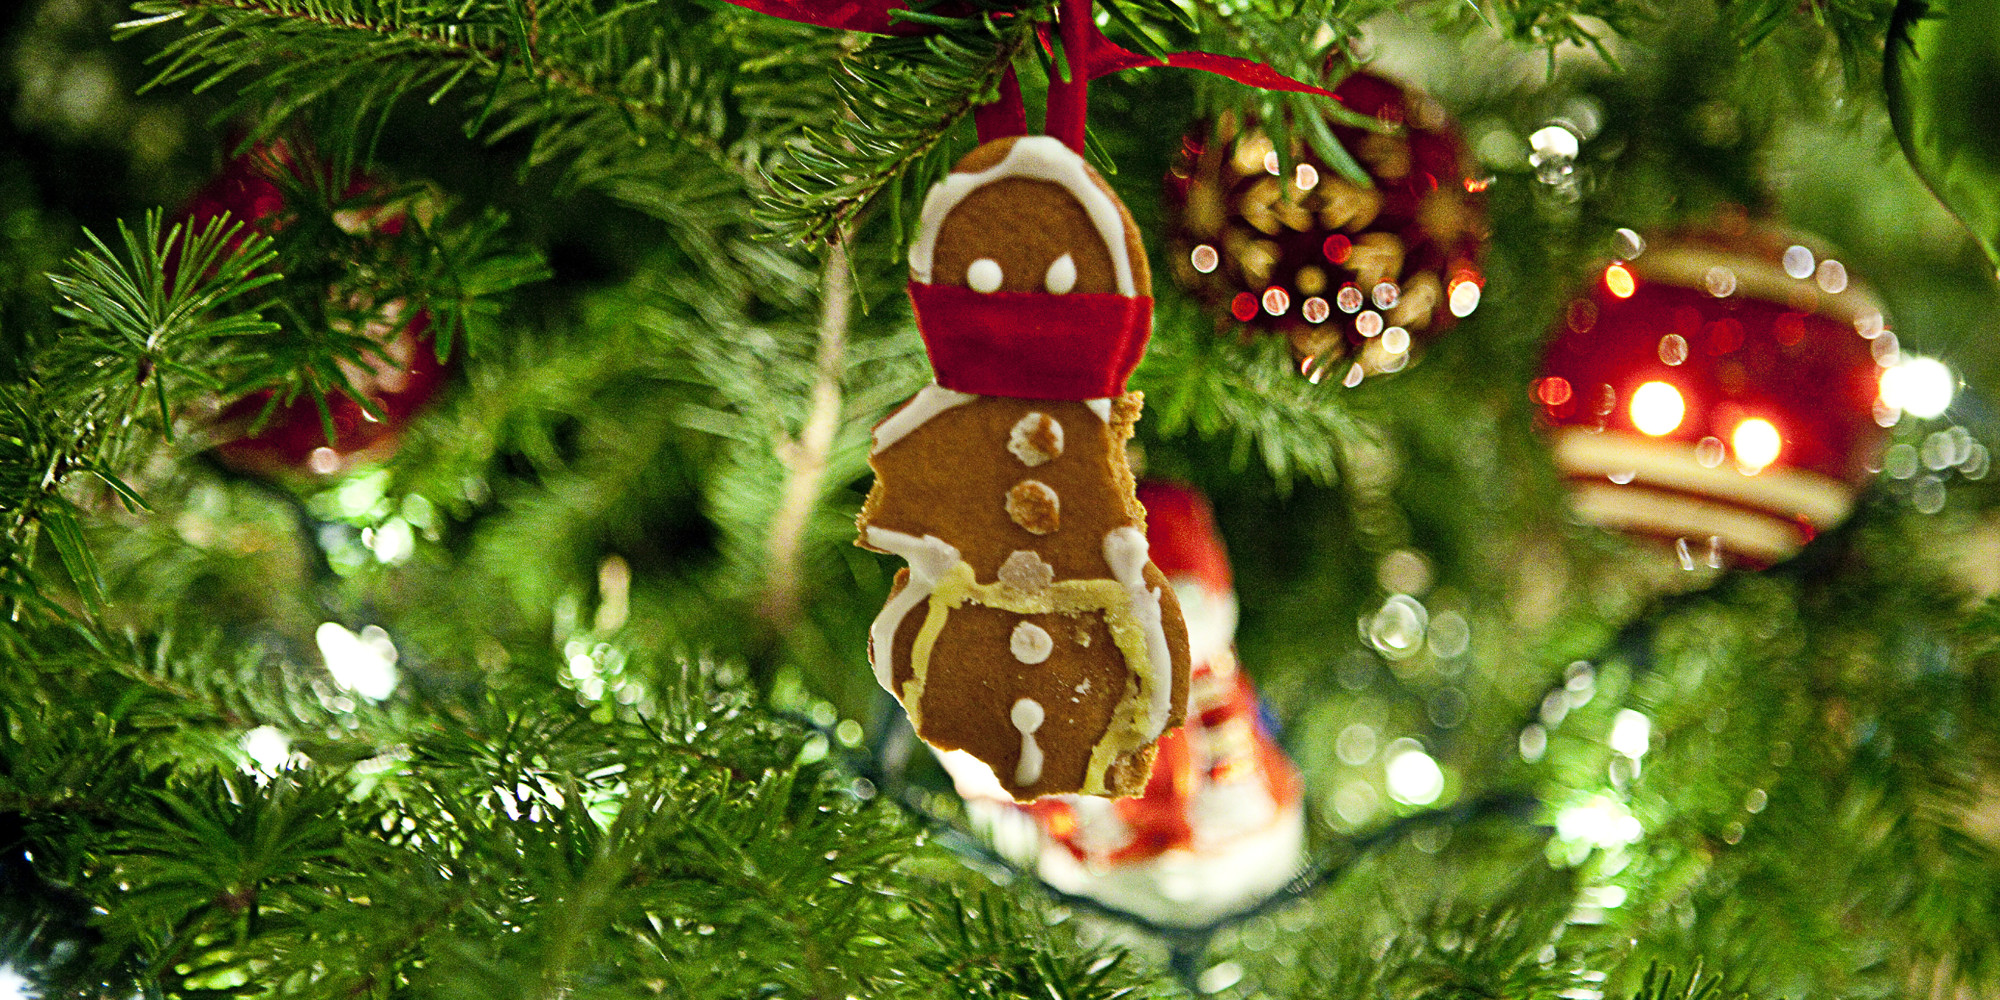 Tree Oh Christmas Tree Fiber Optic Christmas Tree Wwemgwco Oh